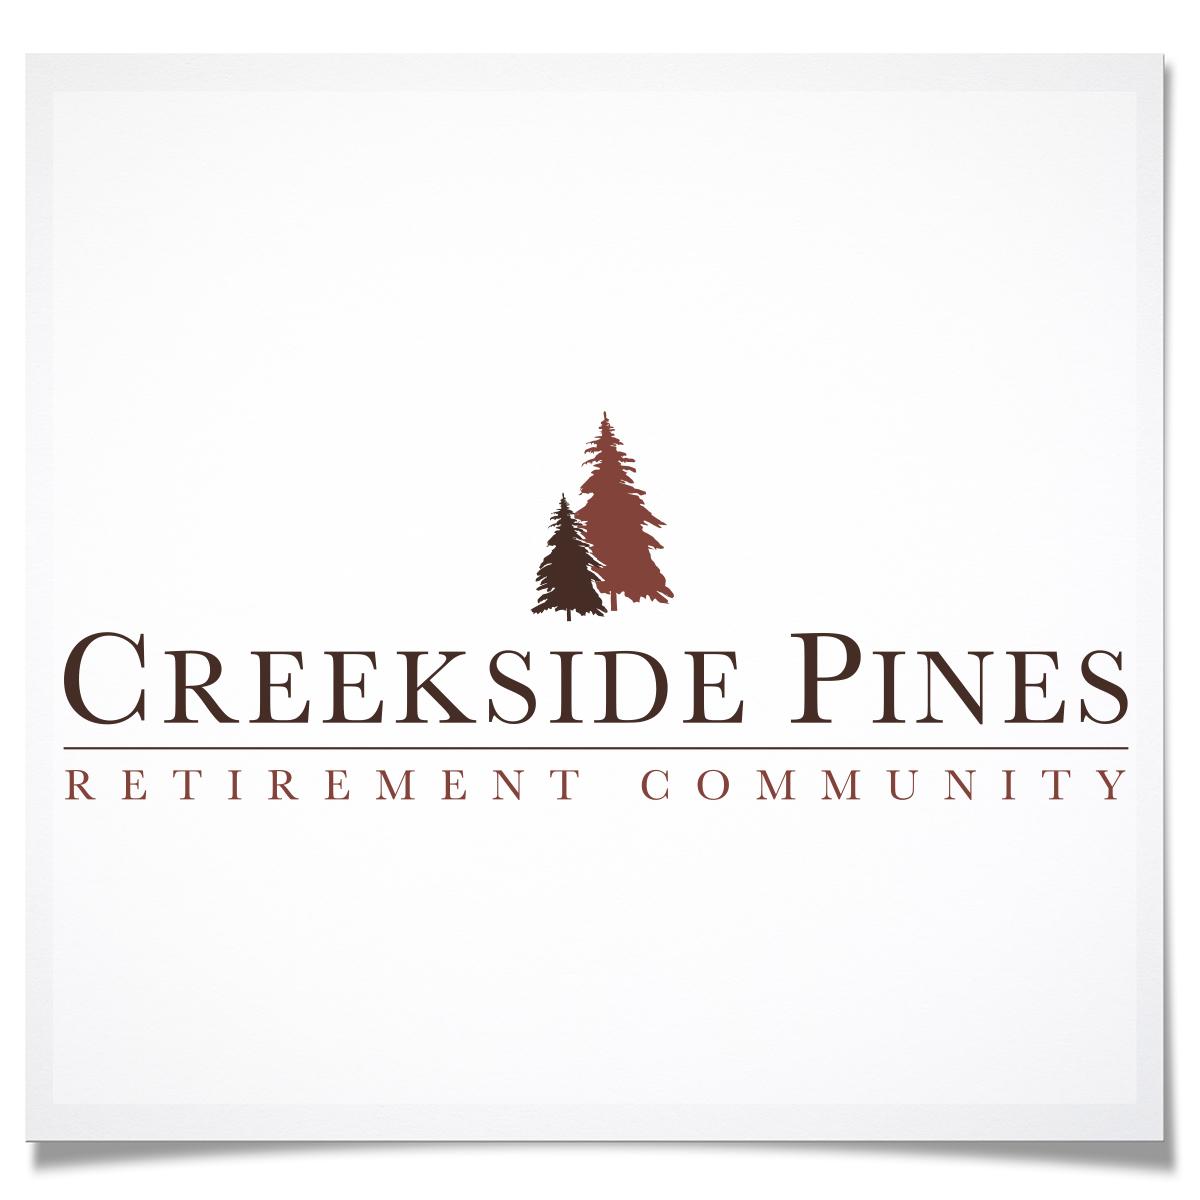 Creekside Pines Retirement Community image 19